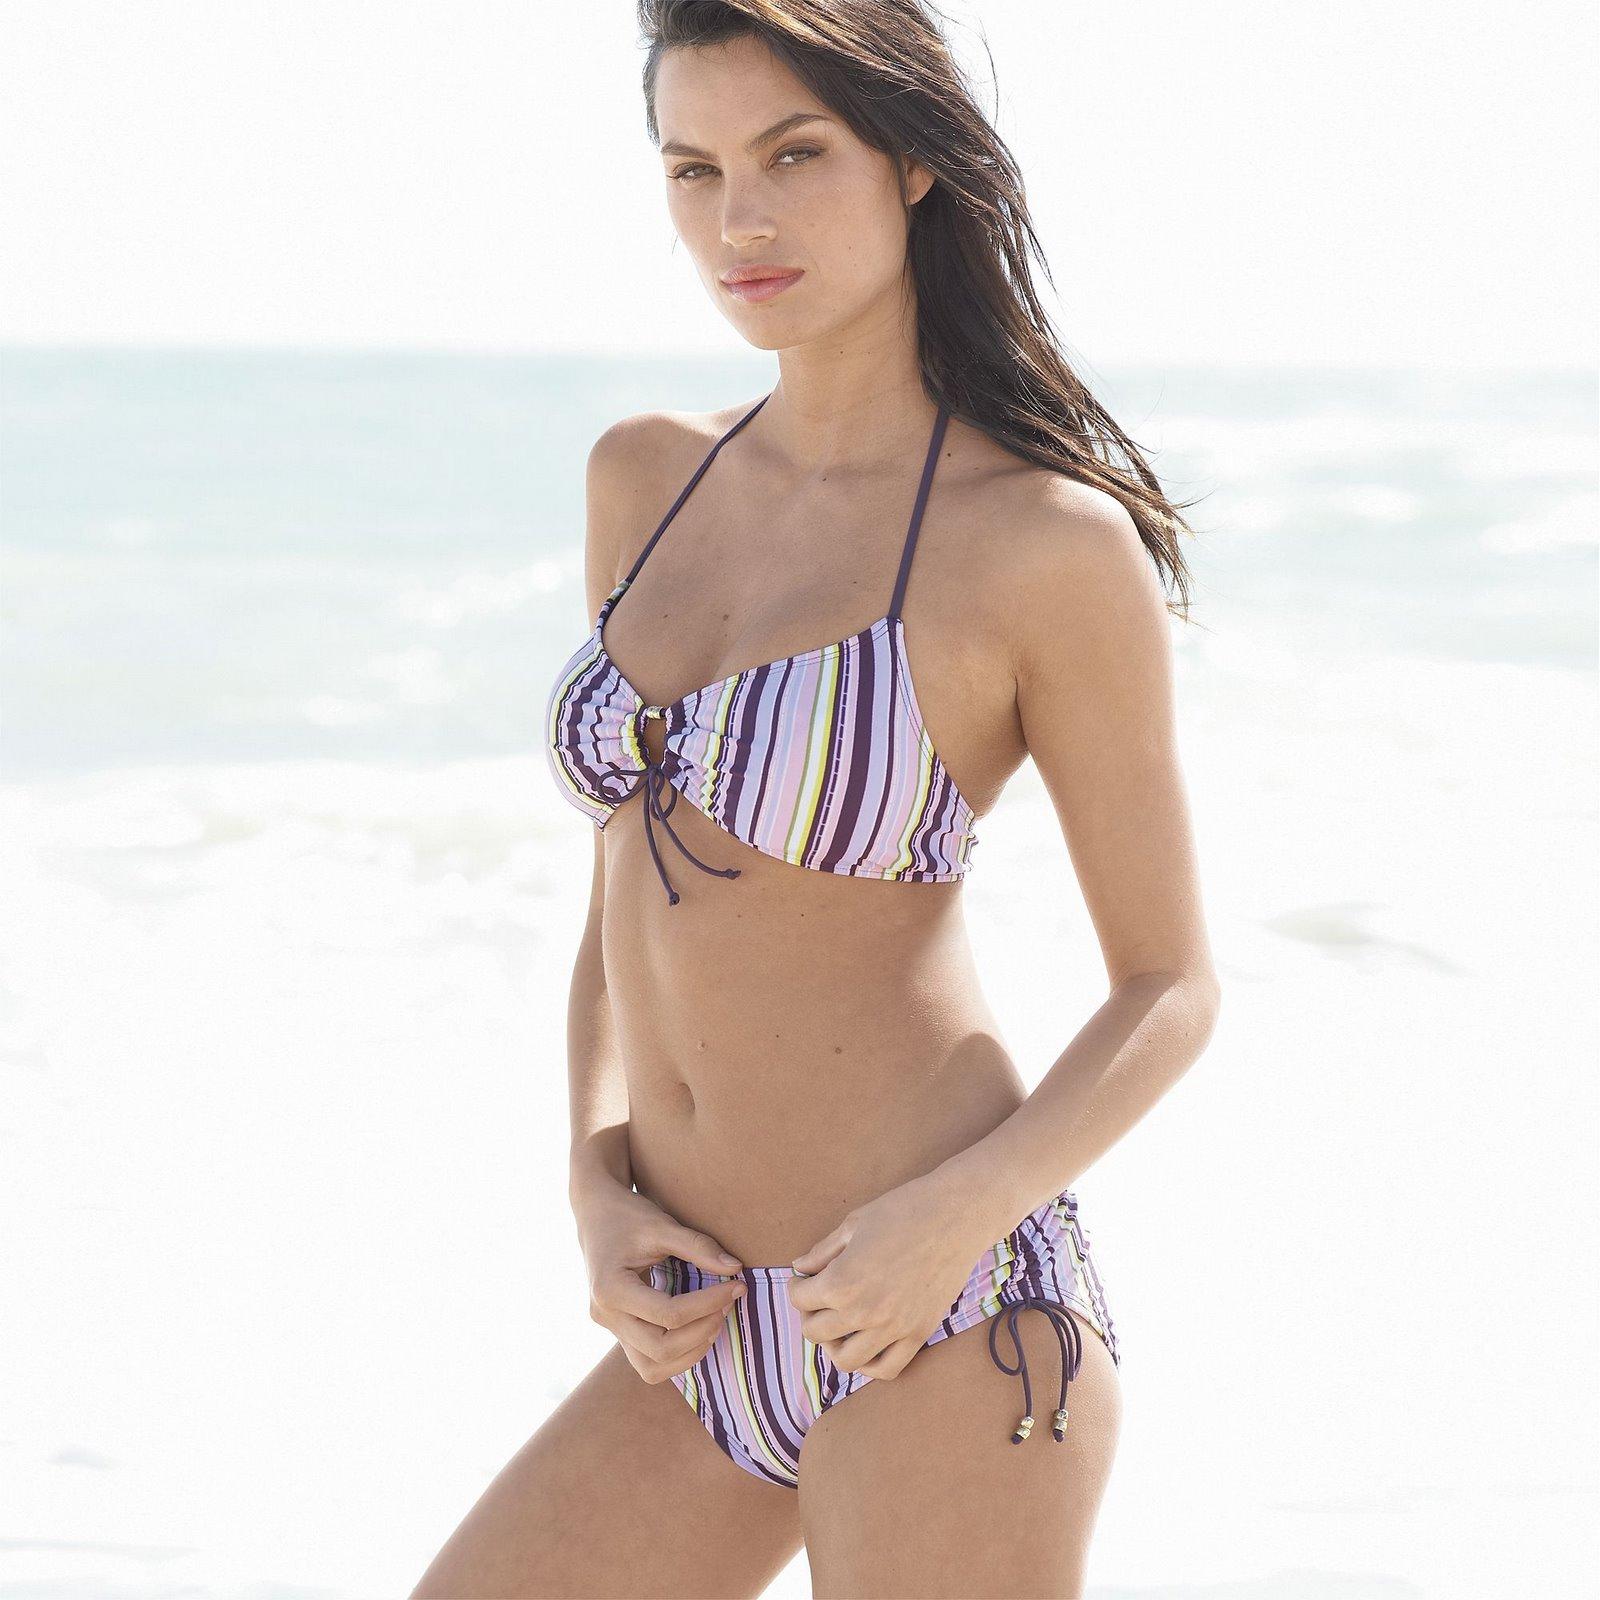 Alina Puscau Hot Bikini